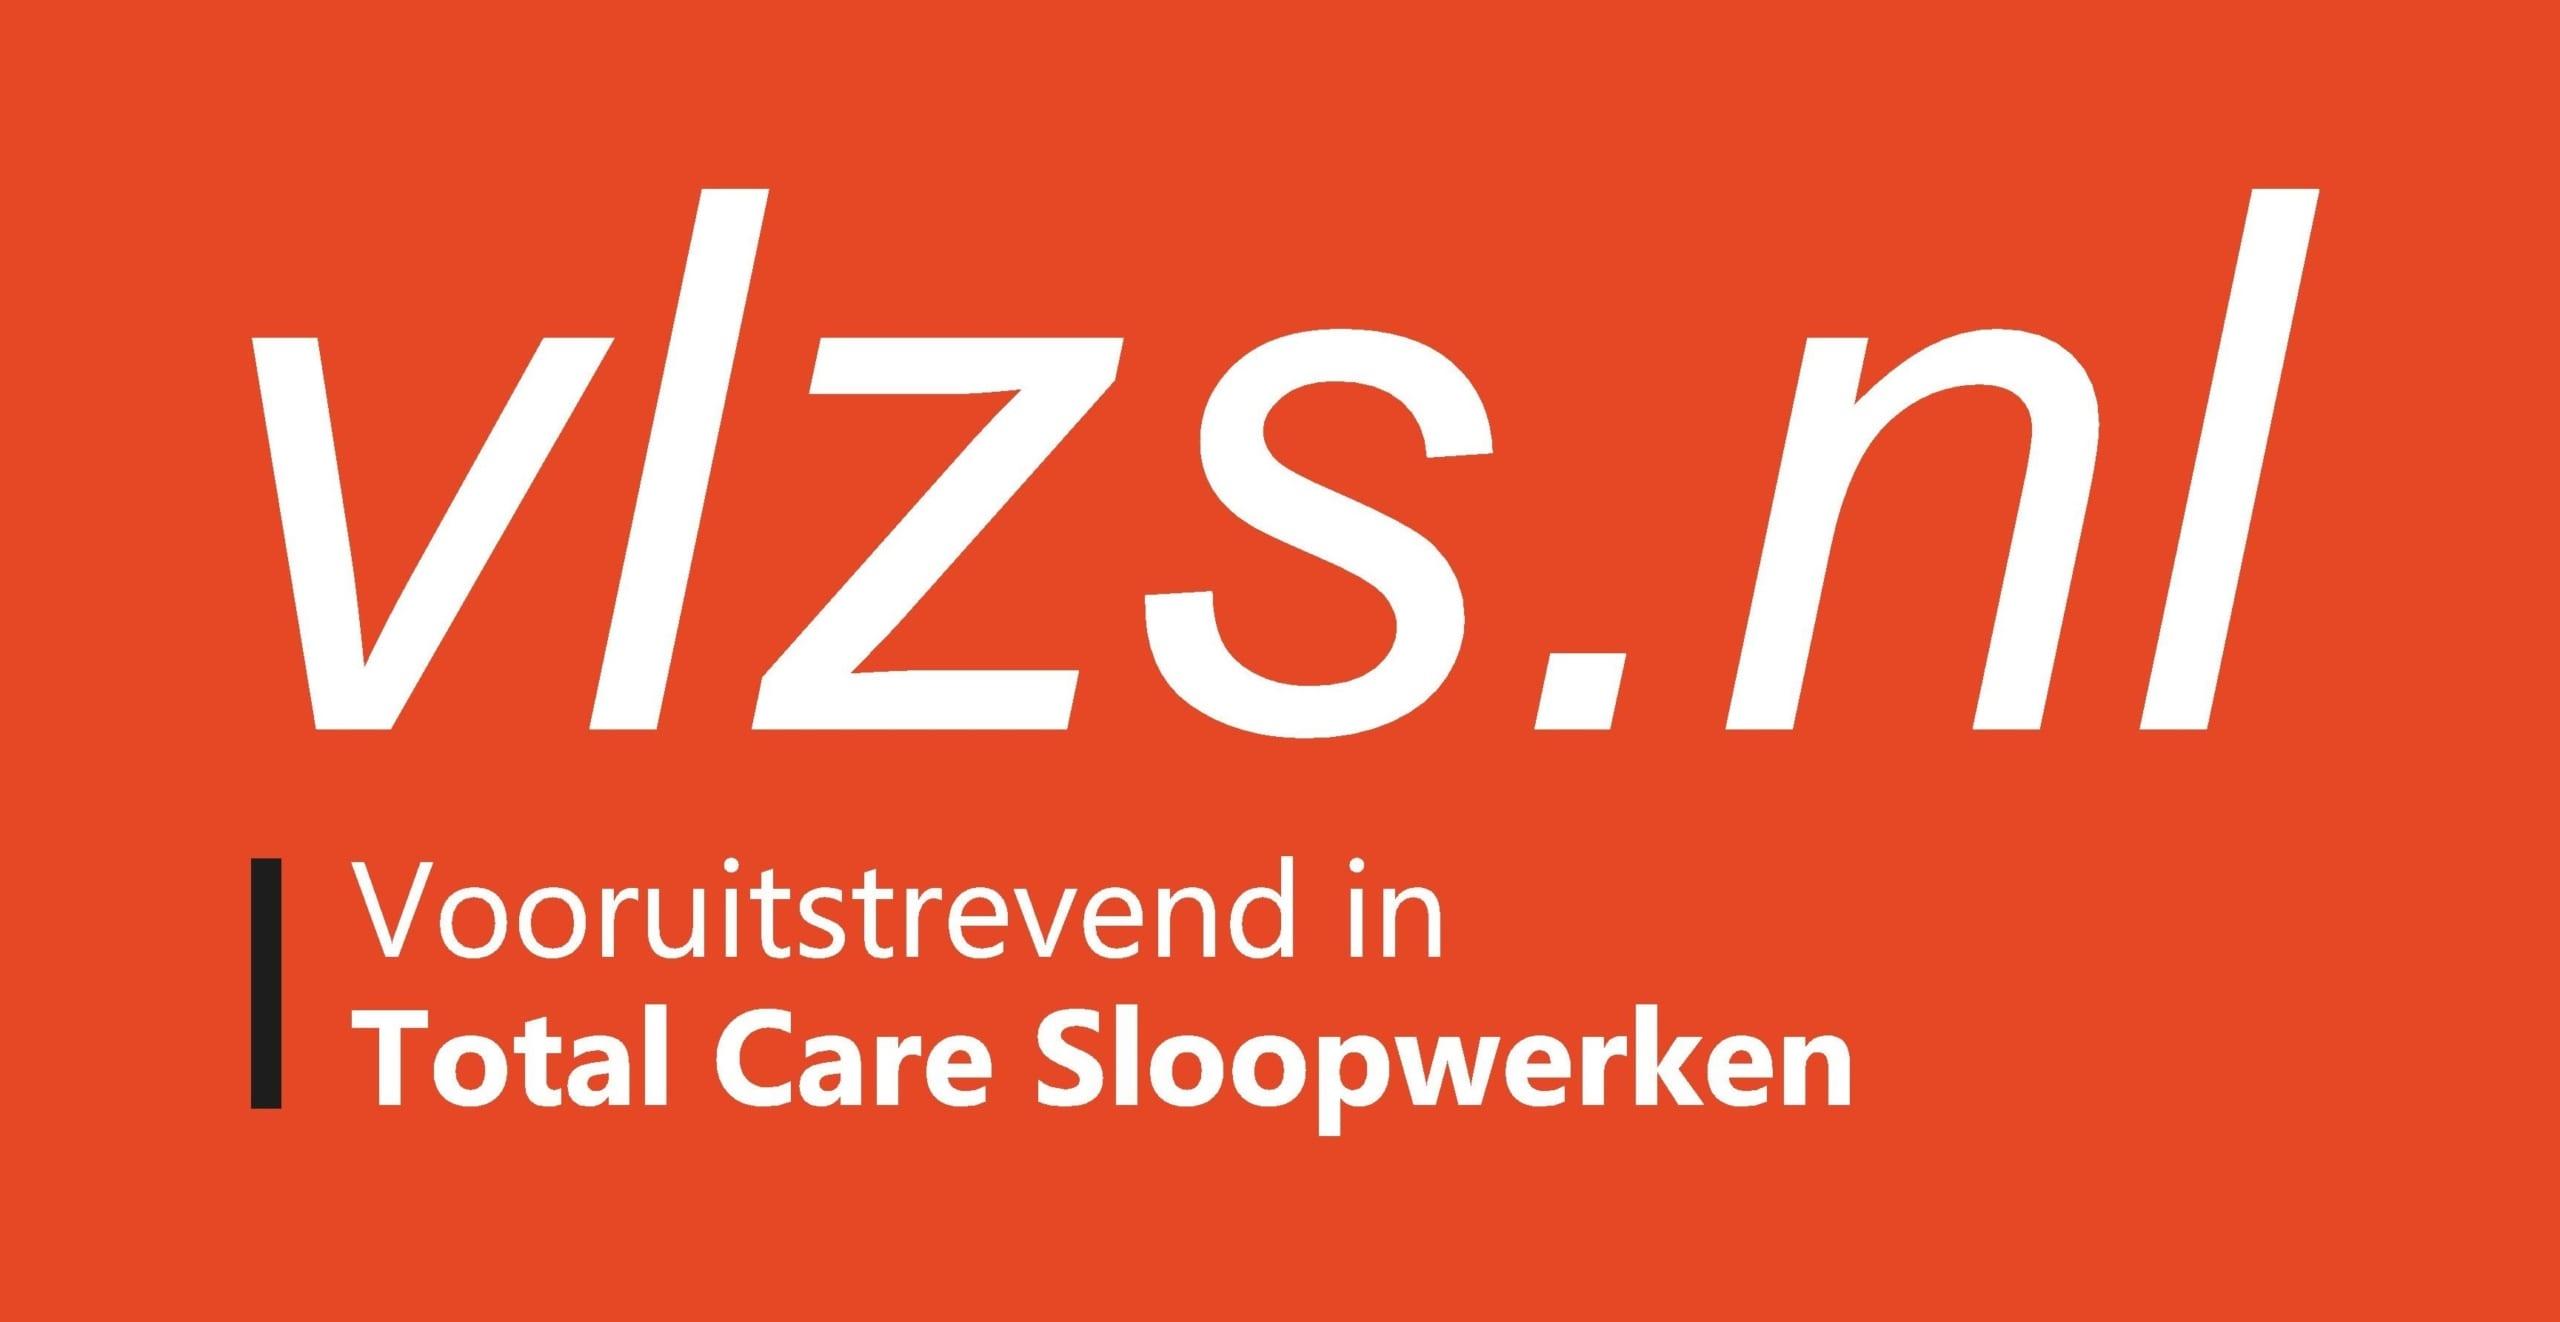 Van Leeuwen Zwanenburg Sloopwerken